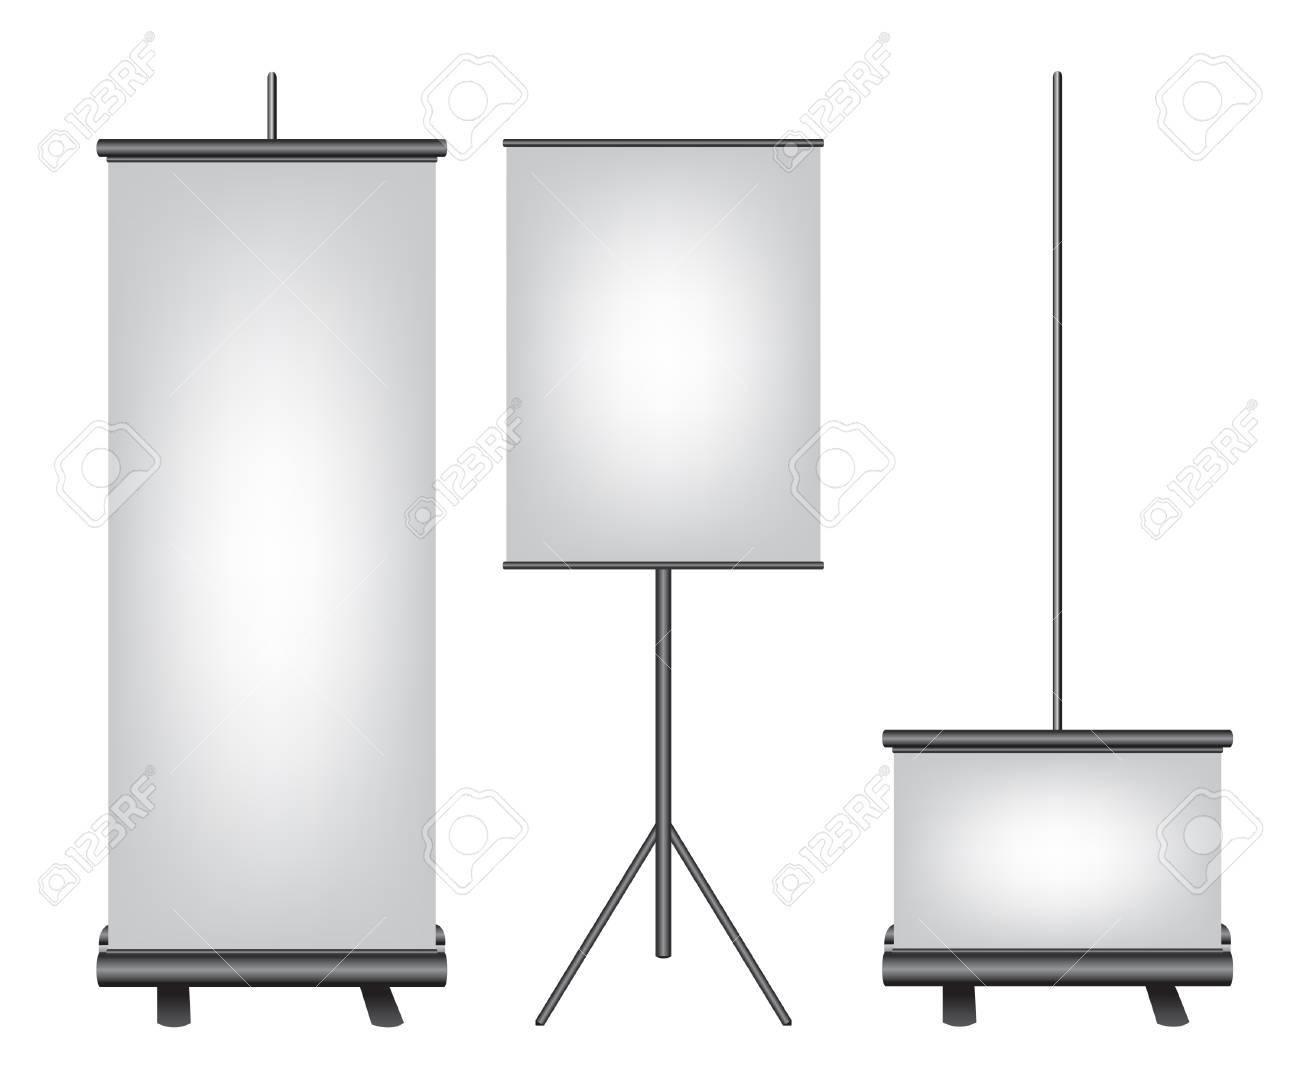 Roll up banner black illustration Stock Vector - 12063388